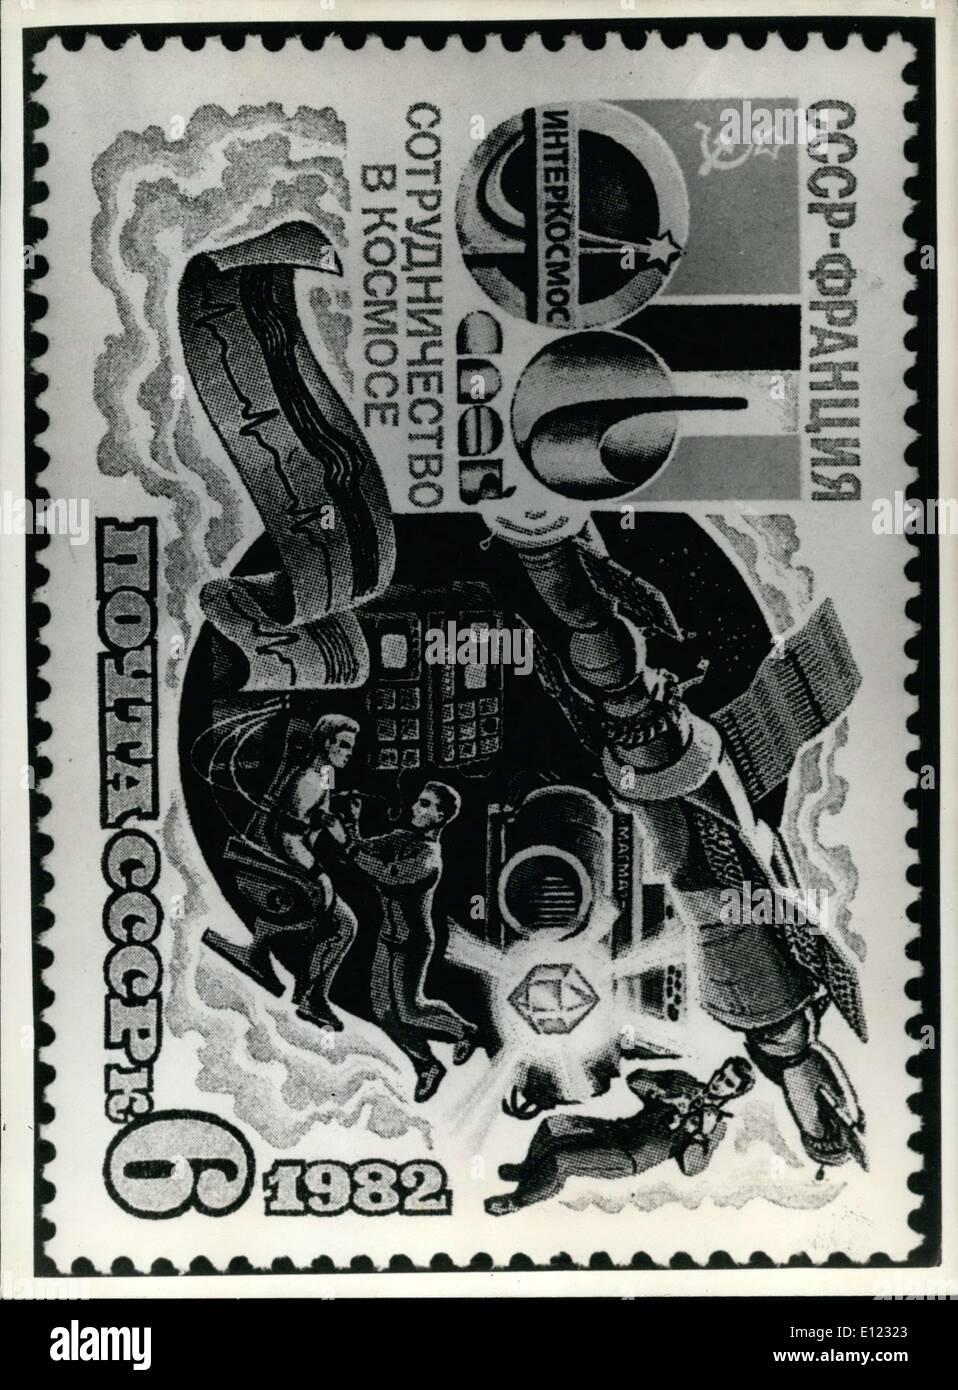 Jul. 08, 1982 - Commemorative Stamp Celebrating the Russian Space Program - Stock Image